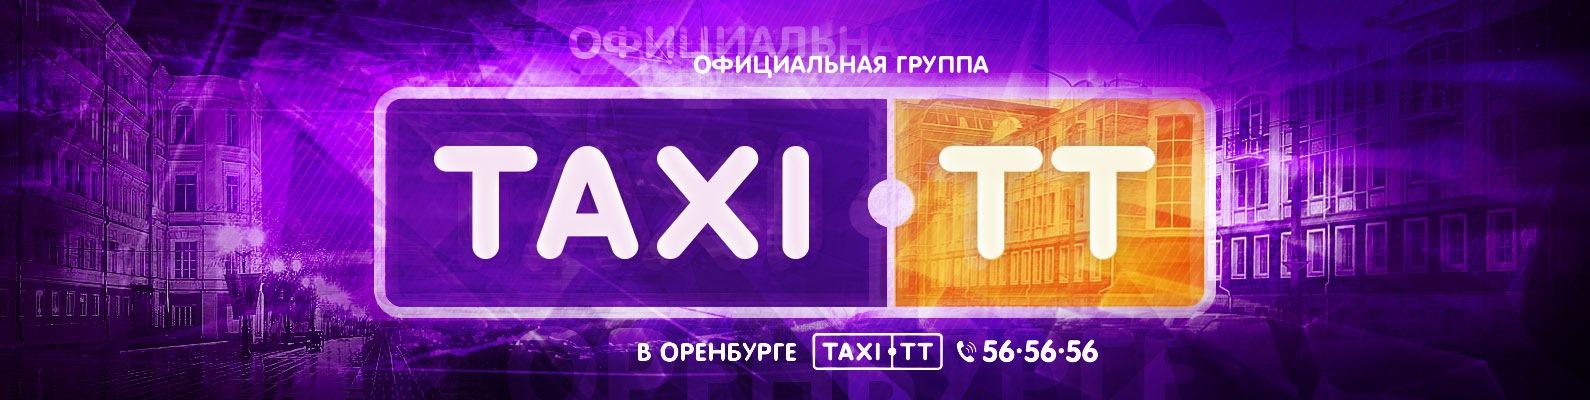 такси тт промокод